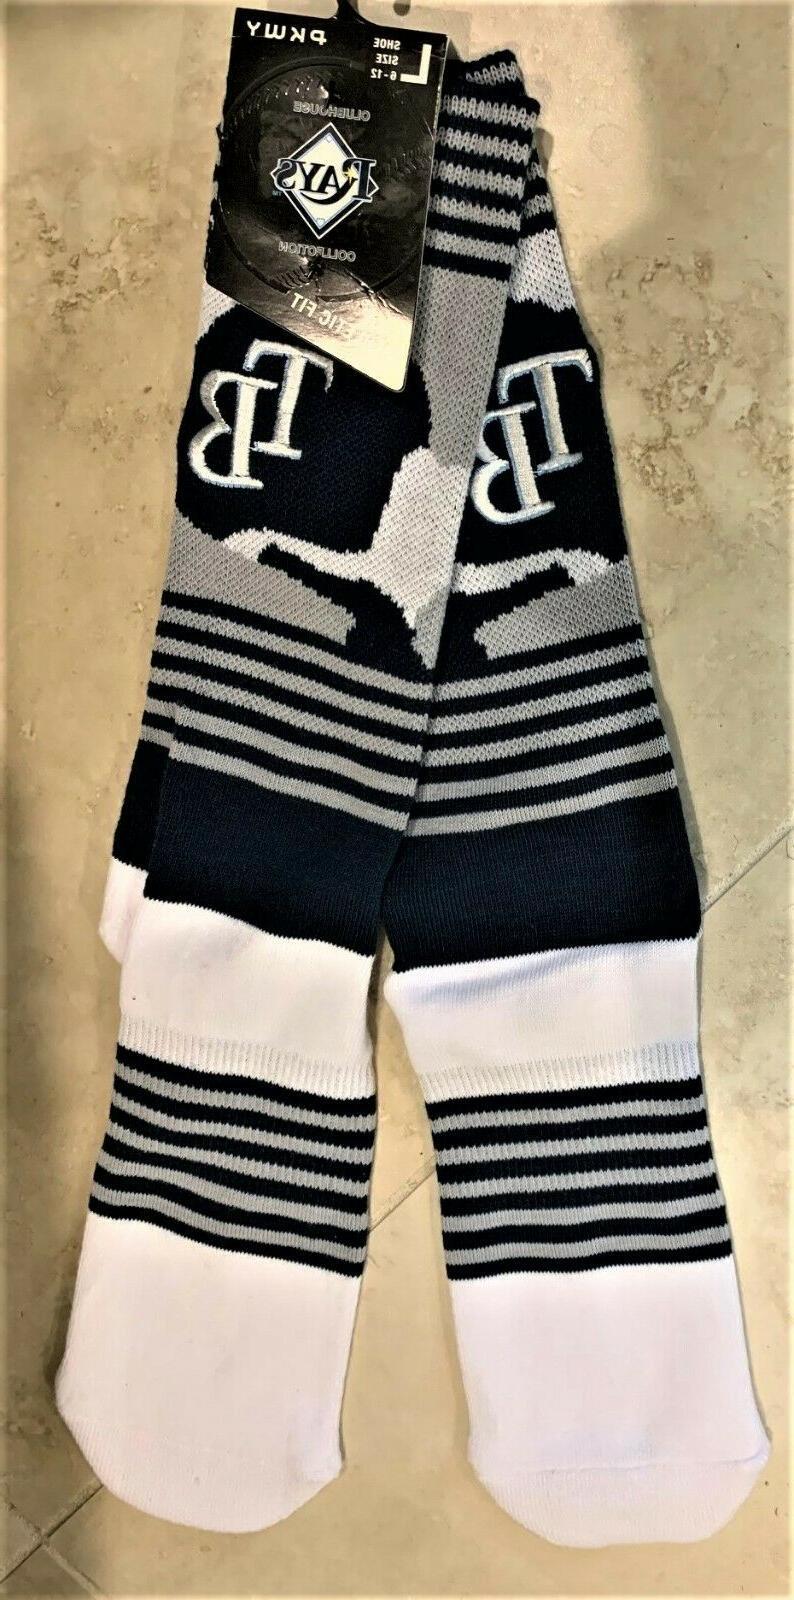 tampa bay rays mlb certified crew socks